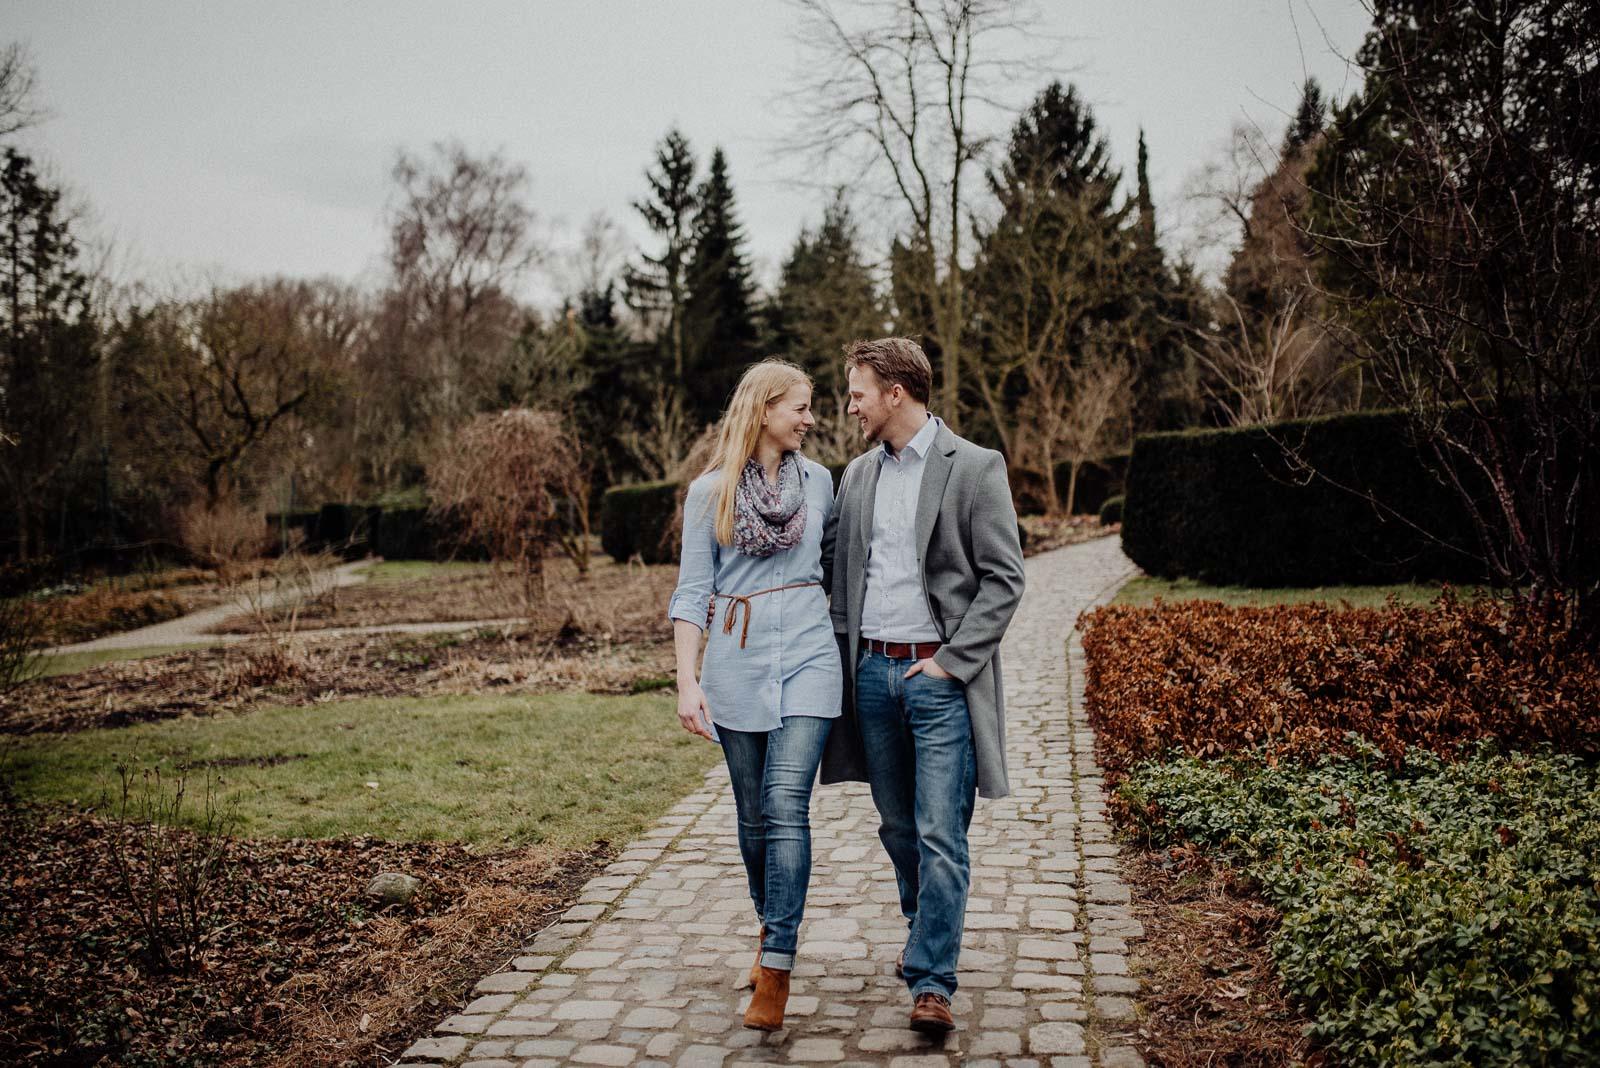 034-verlobungsshooting-engagement-fotograf-witten-rombergpark-dortmund